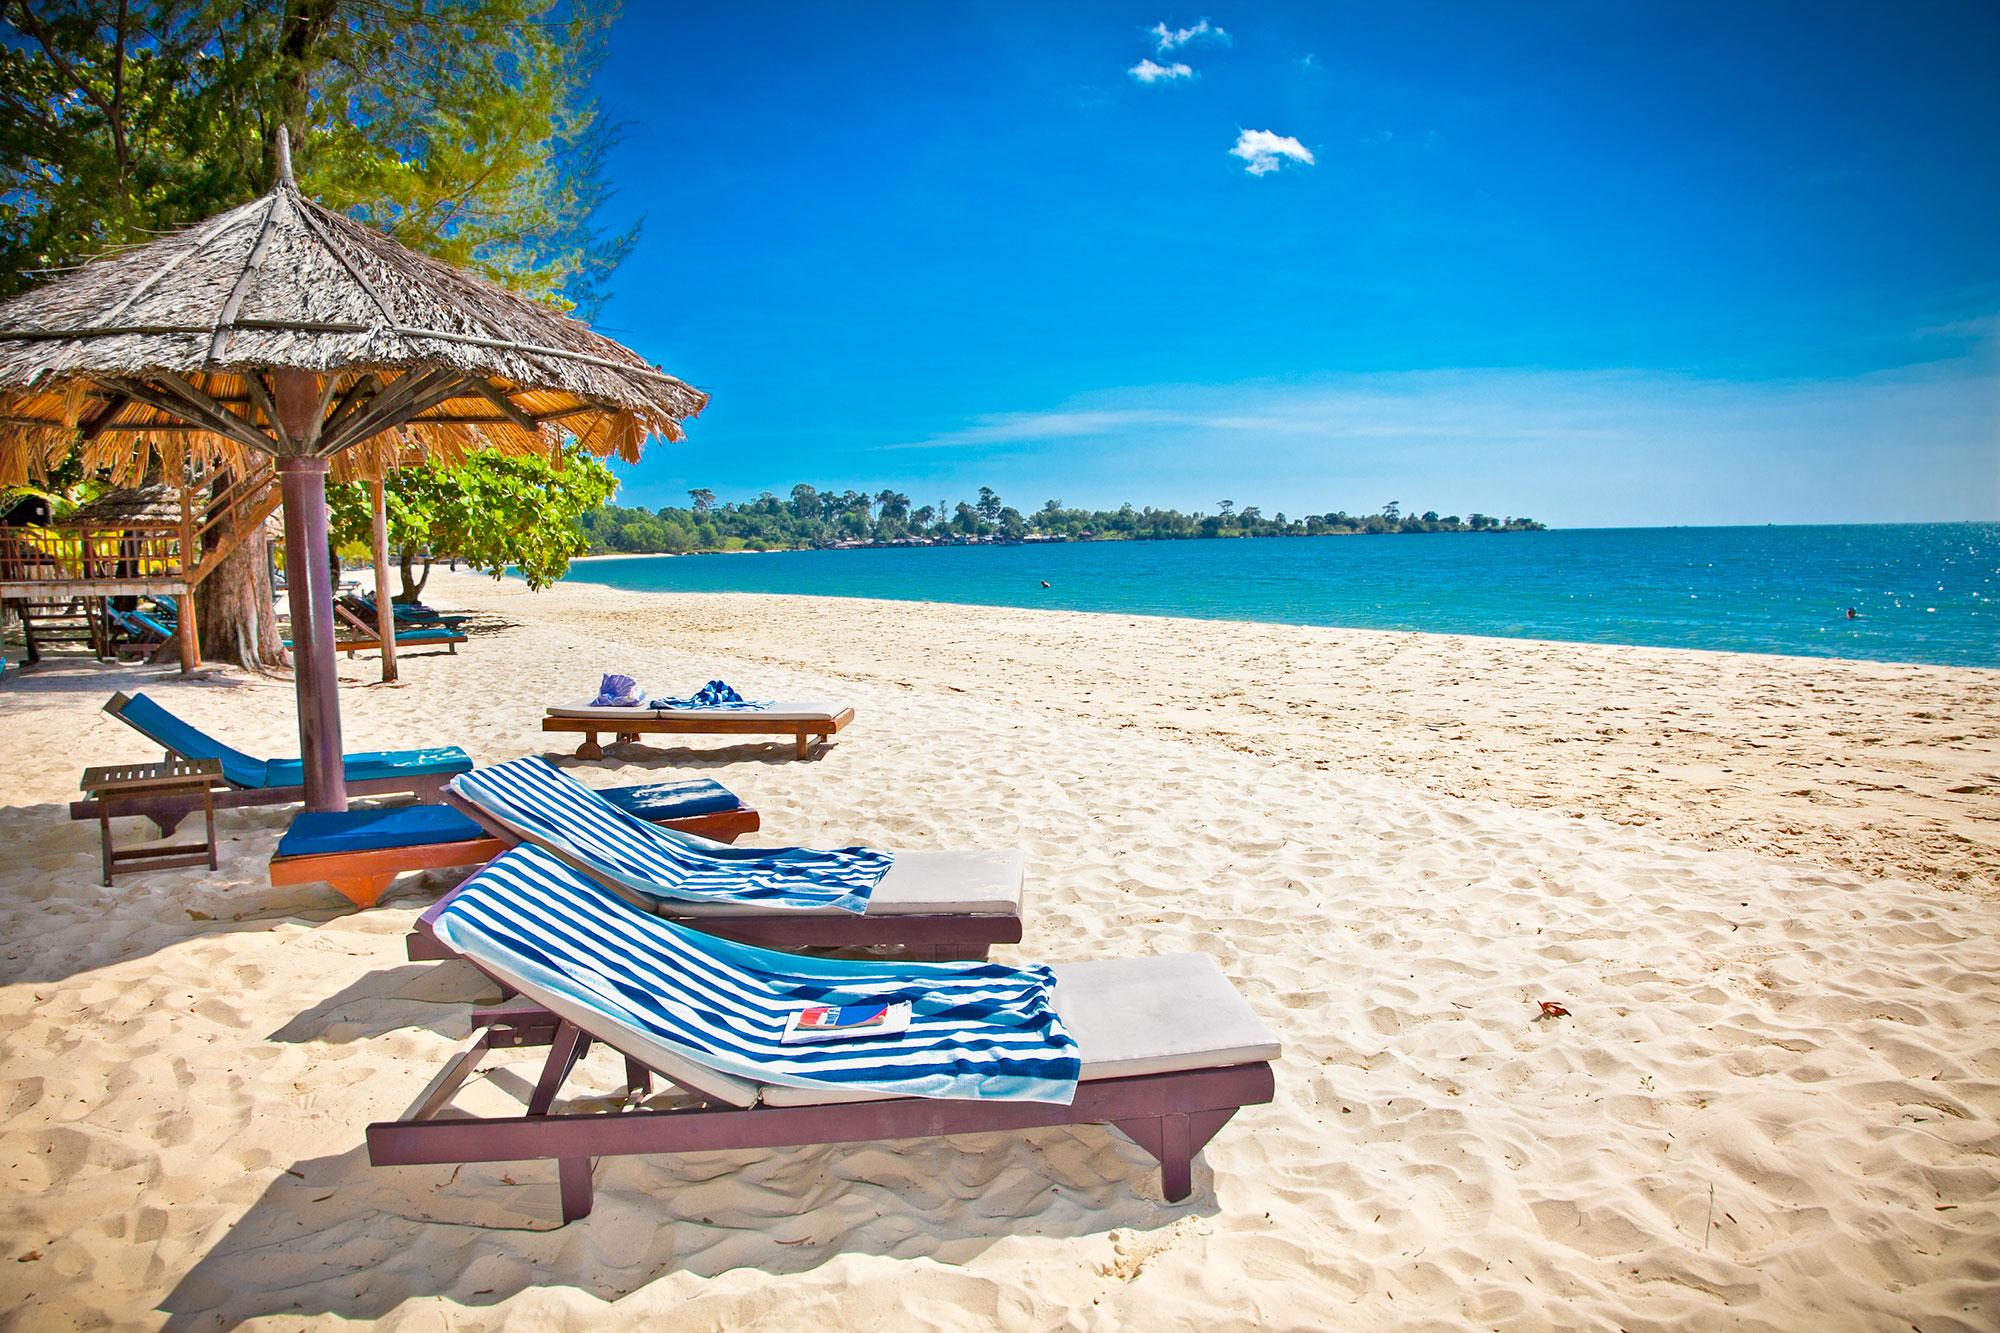 Sokha Beach Sihanoukville